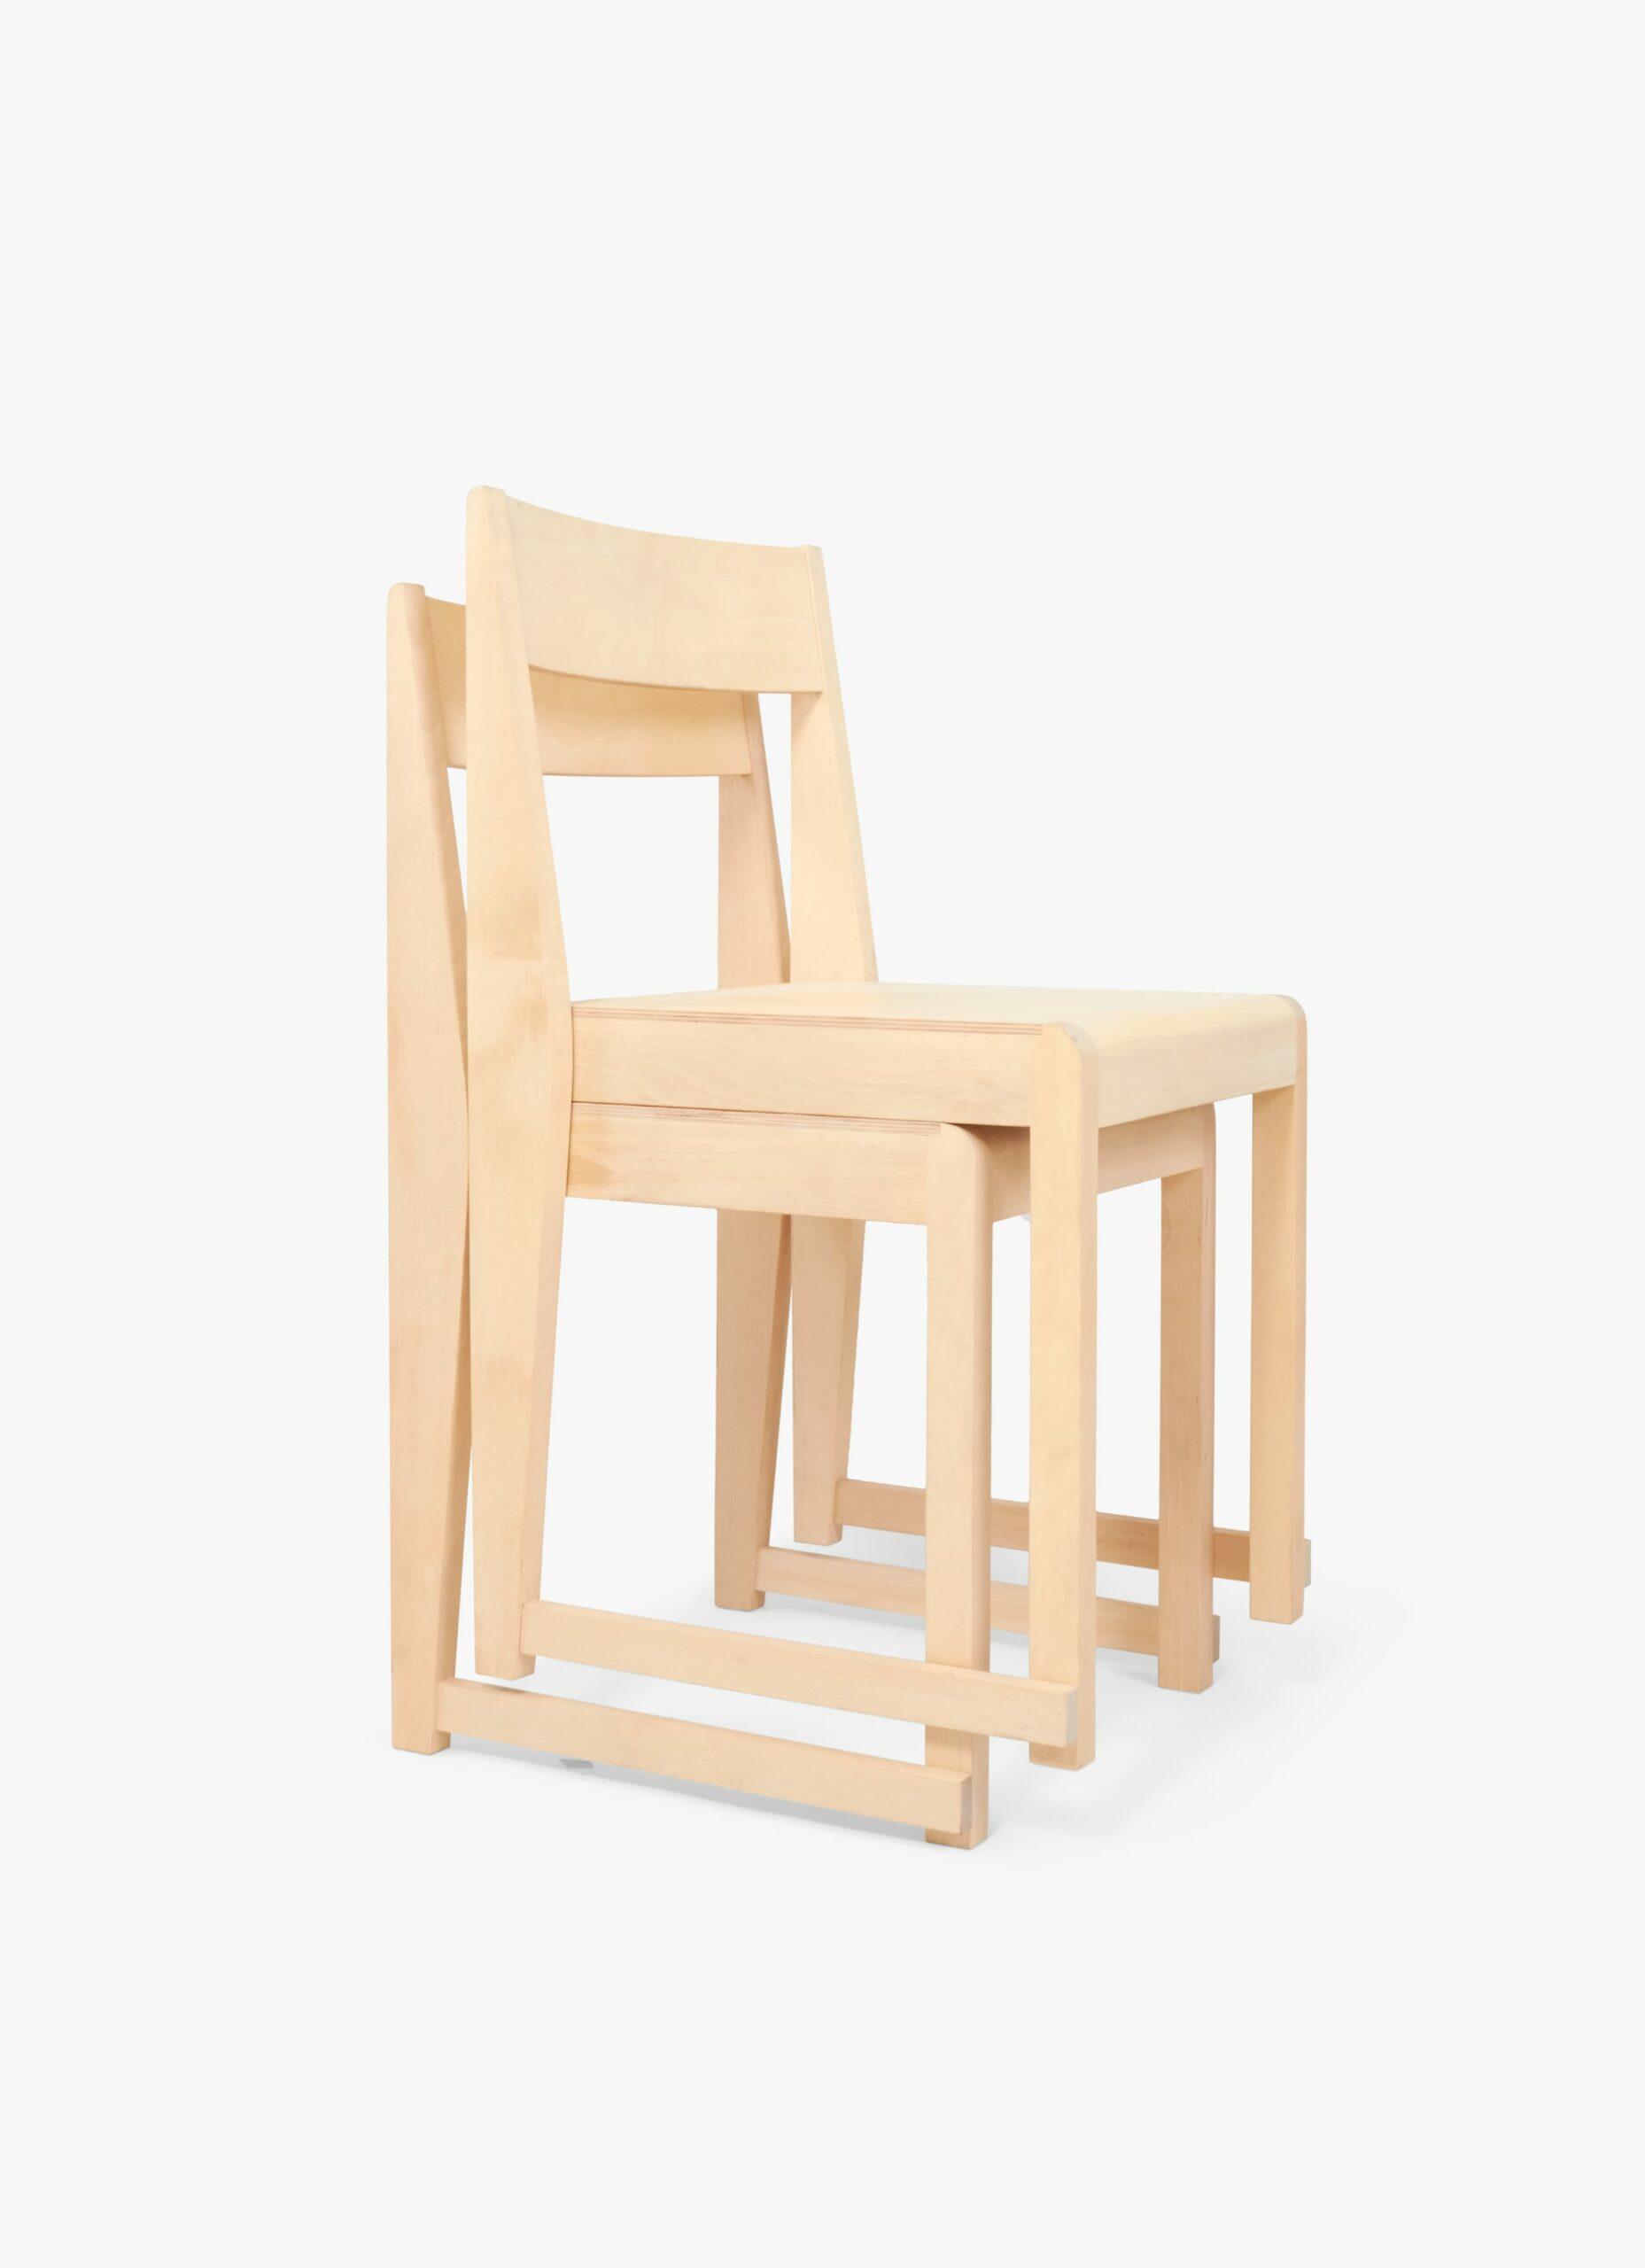 Frama - Chair 01 - Natural Wood Seat